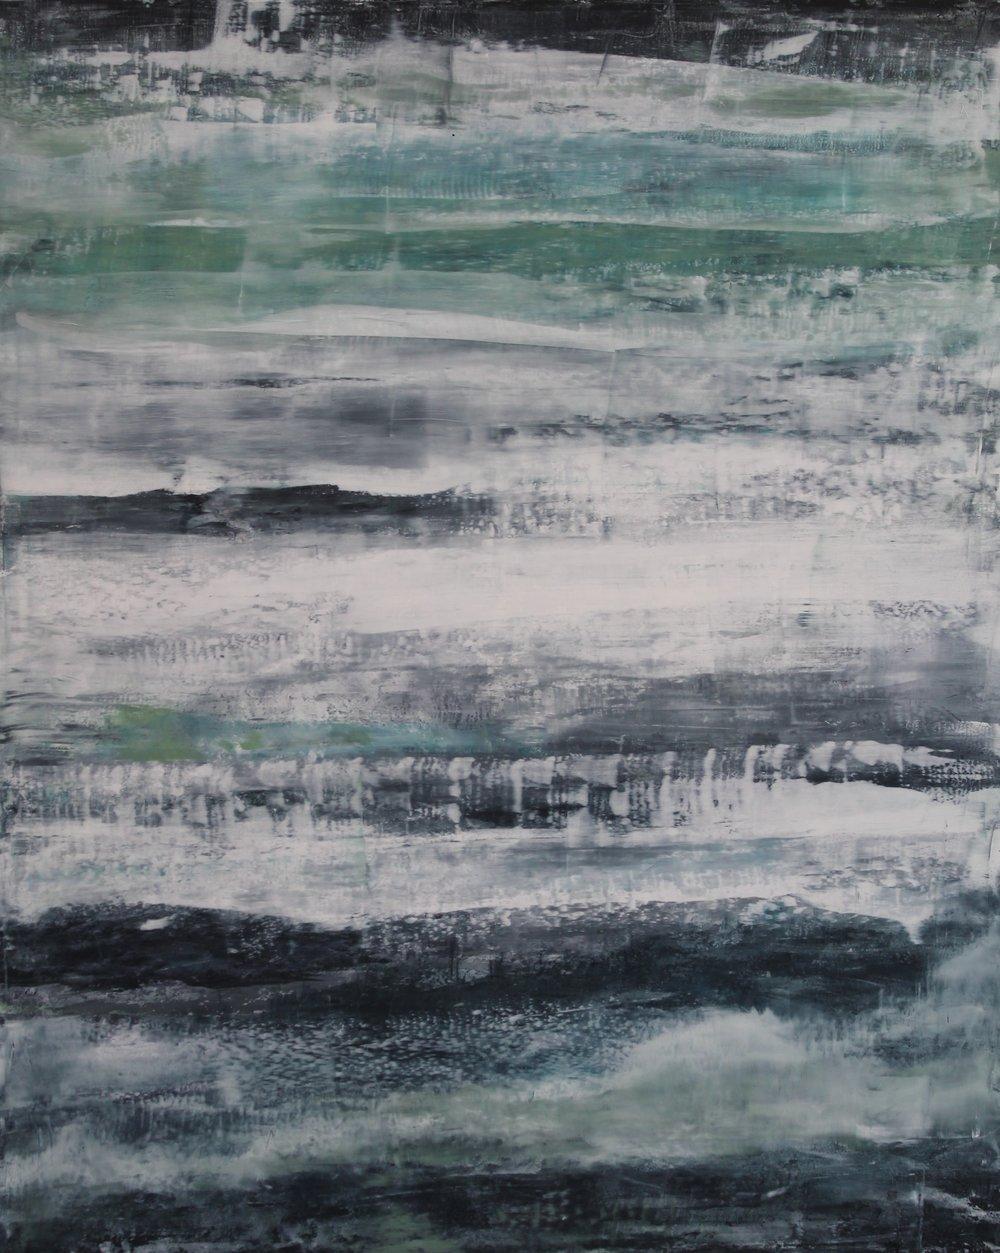 "Seafoam 16x20"" oil and wax on wood panel  $425"